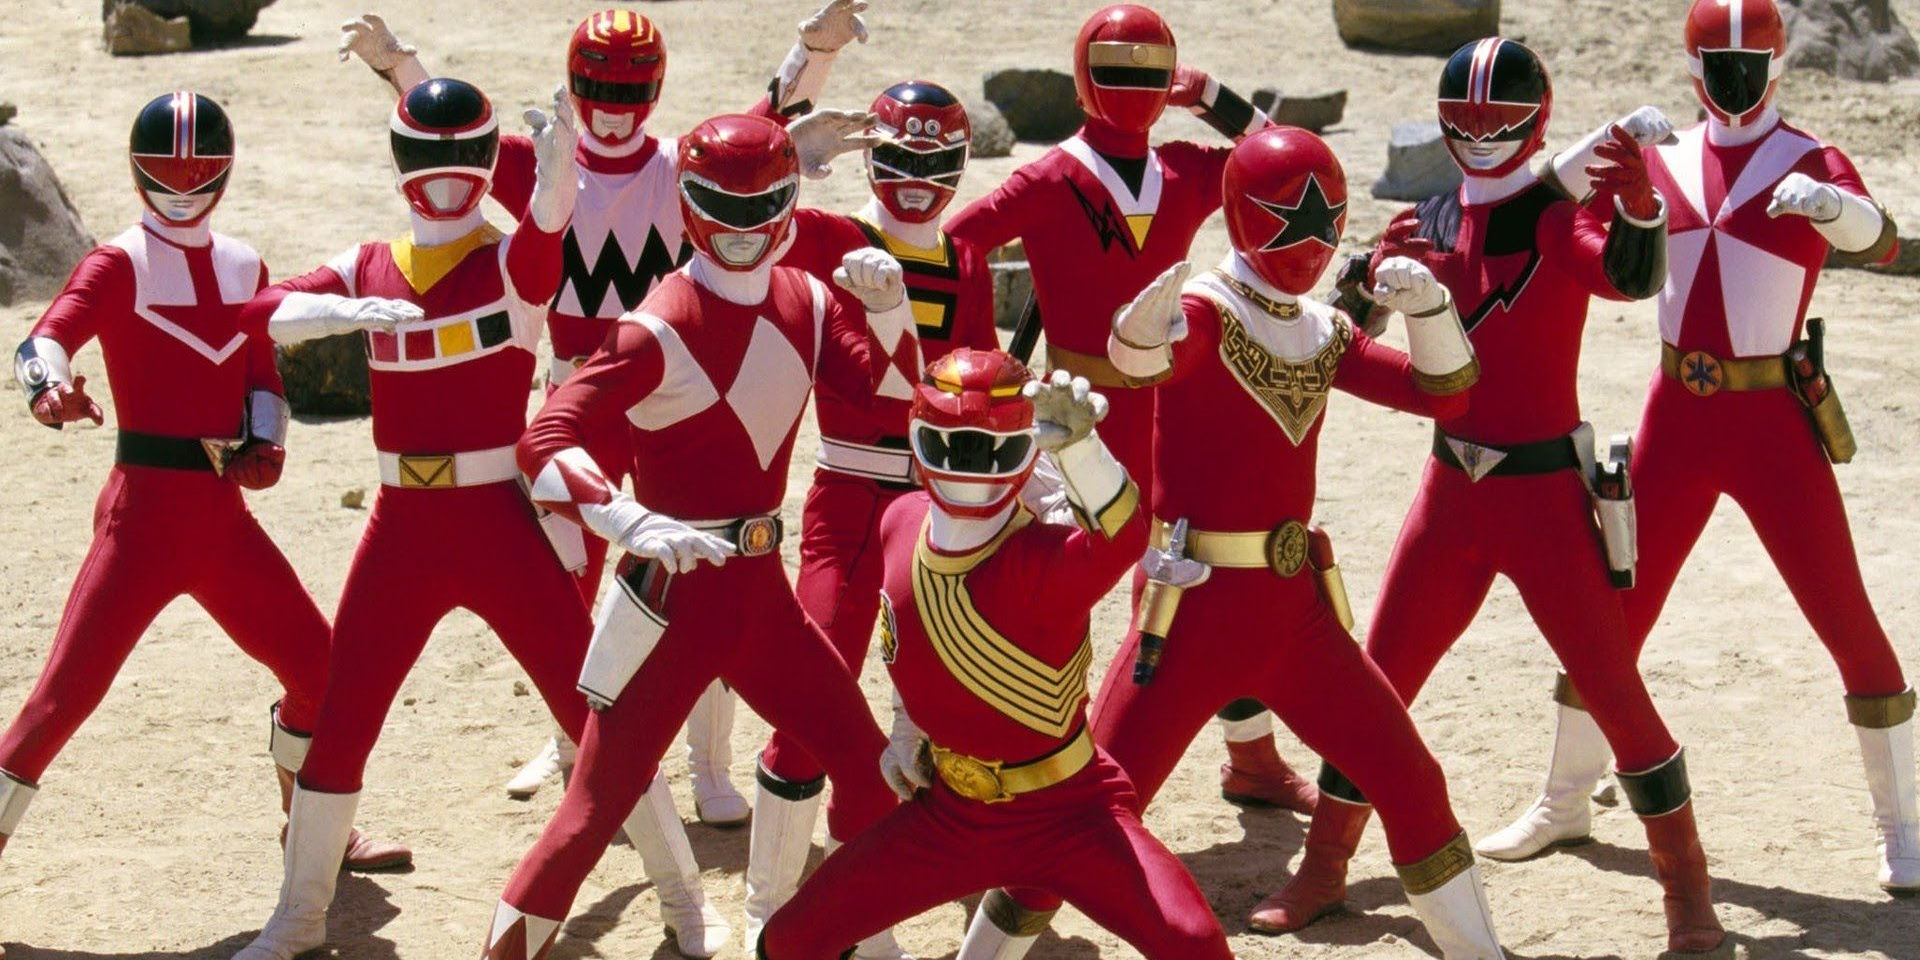 Every Red Power Ranger